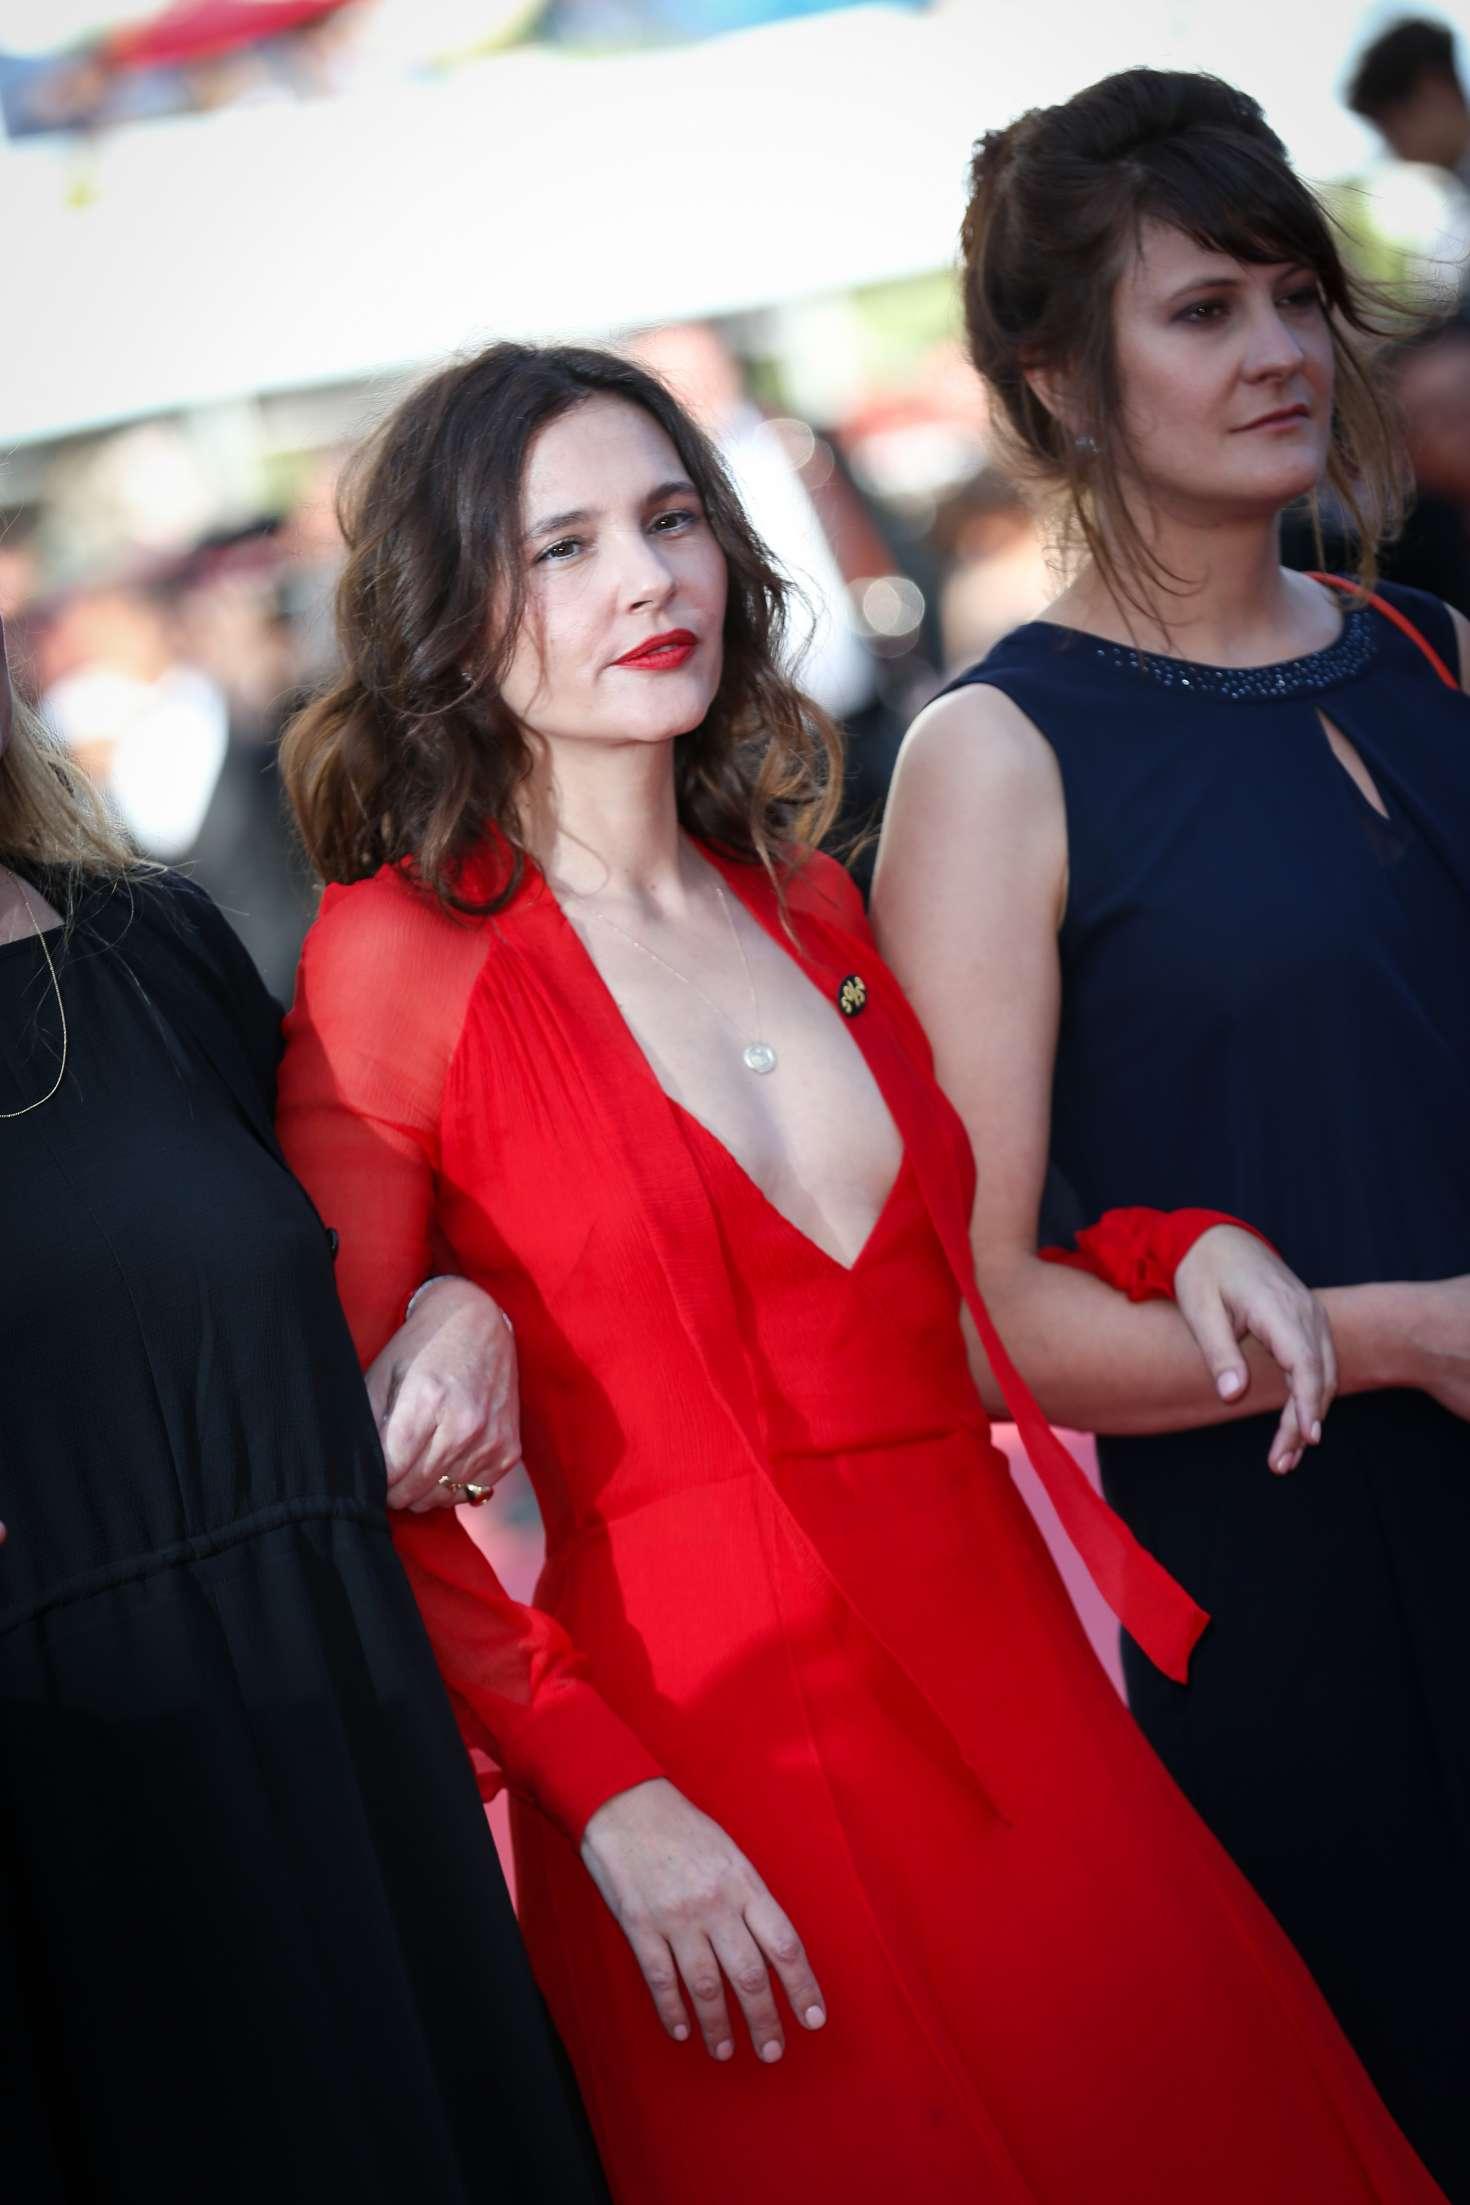 http://www.gotceleb.com/wp-content/uploads/photos/virginie-ledoyen/girls-of-the-sun-premiere-at-2018-cannes-film-festival/Virginie-Ledoyen:-Girls-Of-The-Sun-Premiere-at-2018-Cannes-Film-Festival--05.jpg